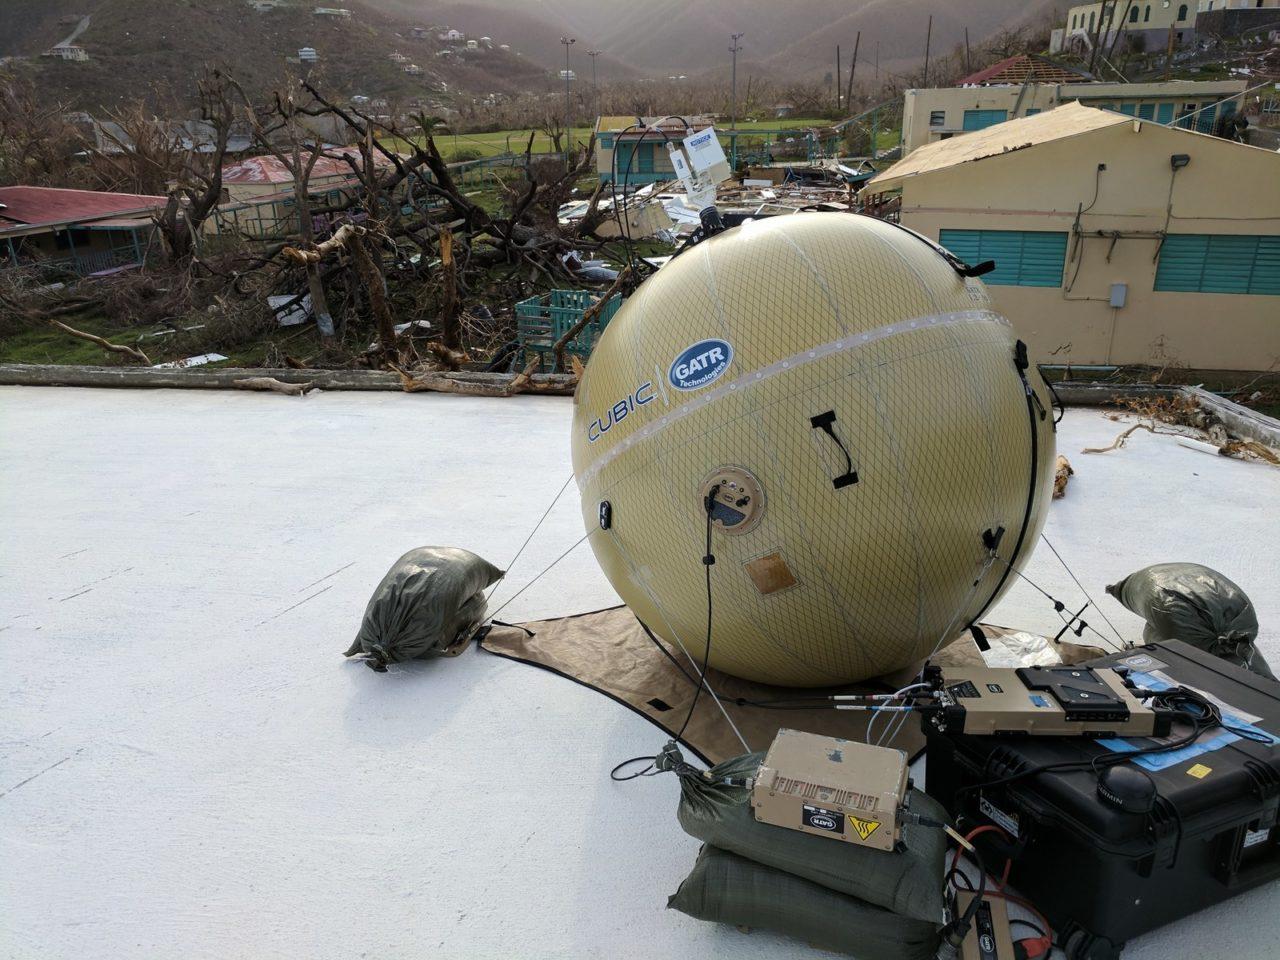 GATR antennas currently deployed in St. John. Photo: Cubic.